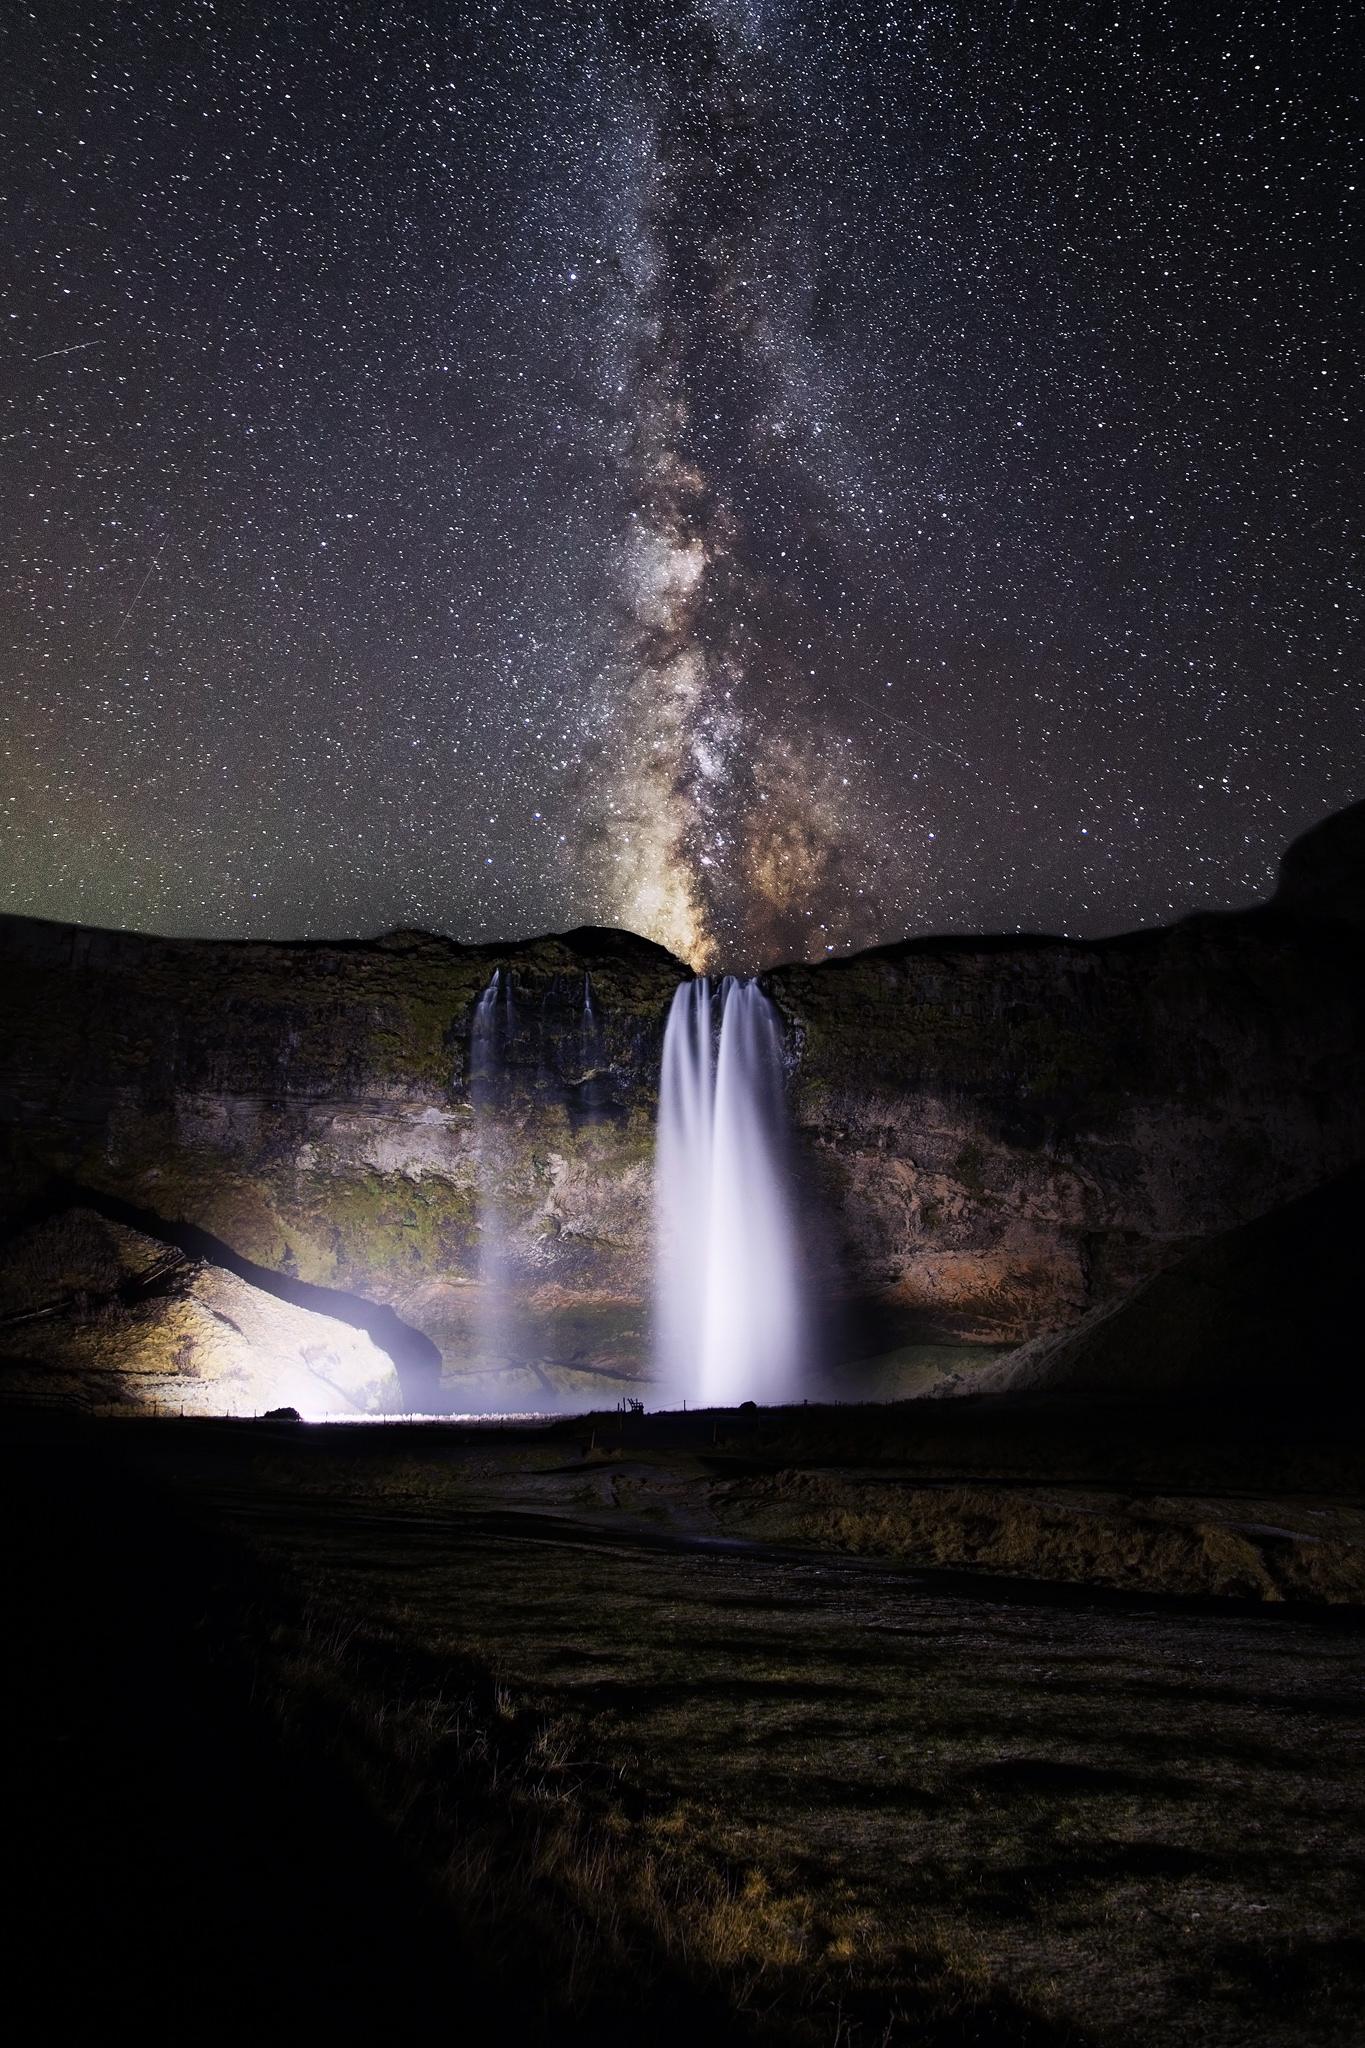 Waterfall-at-night.jpg